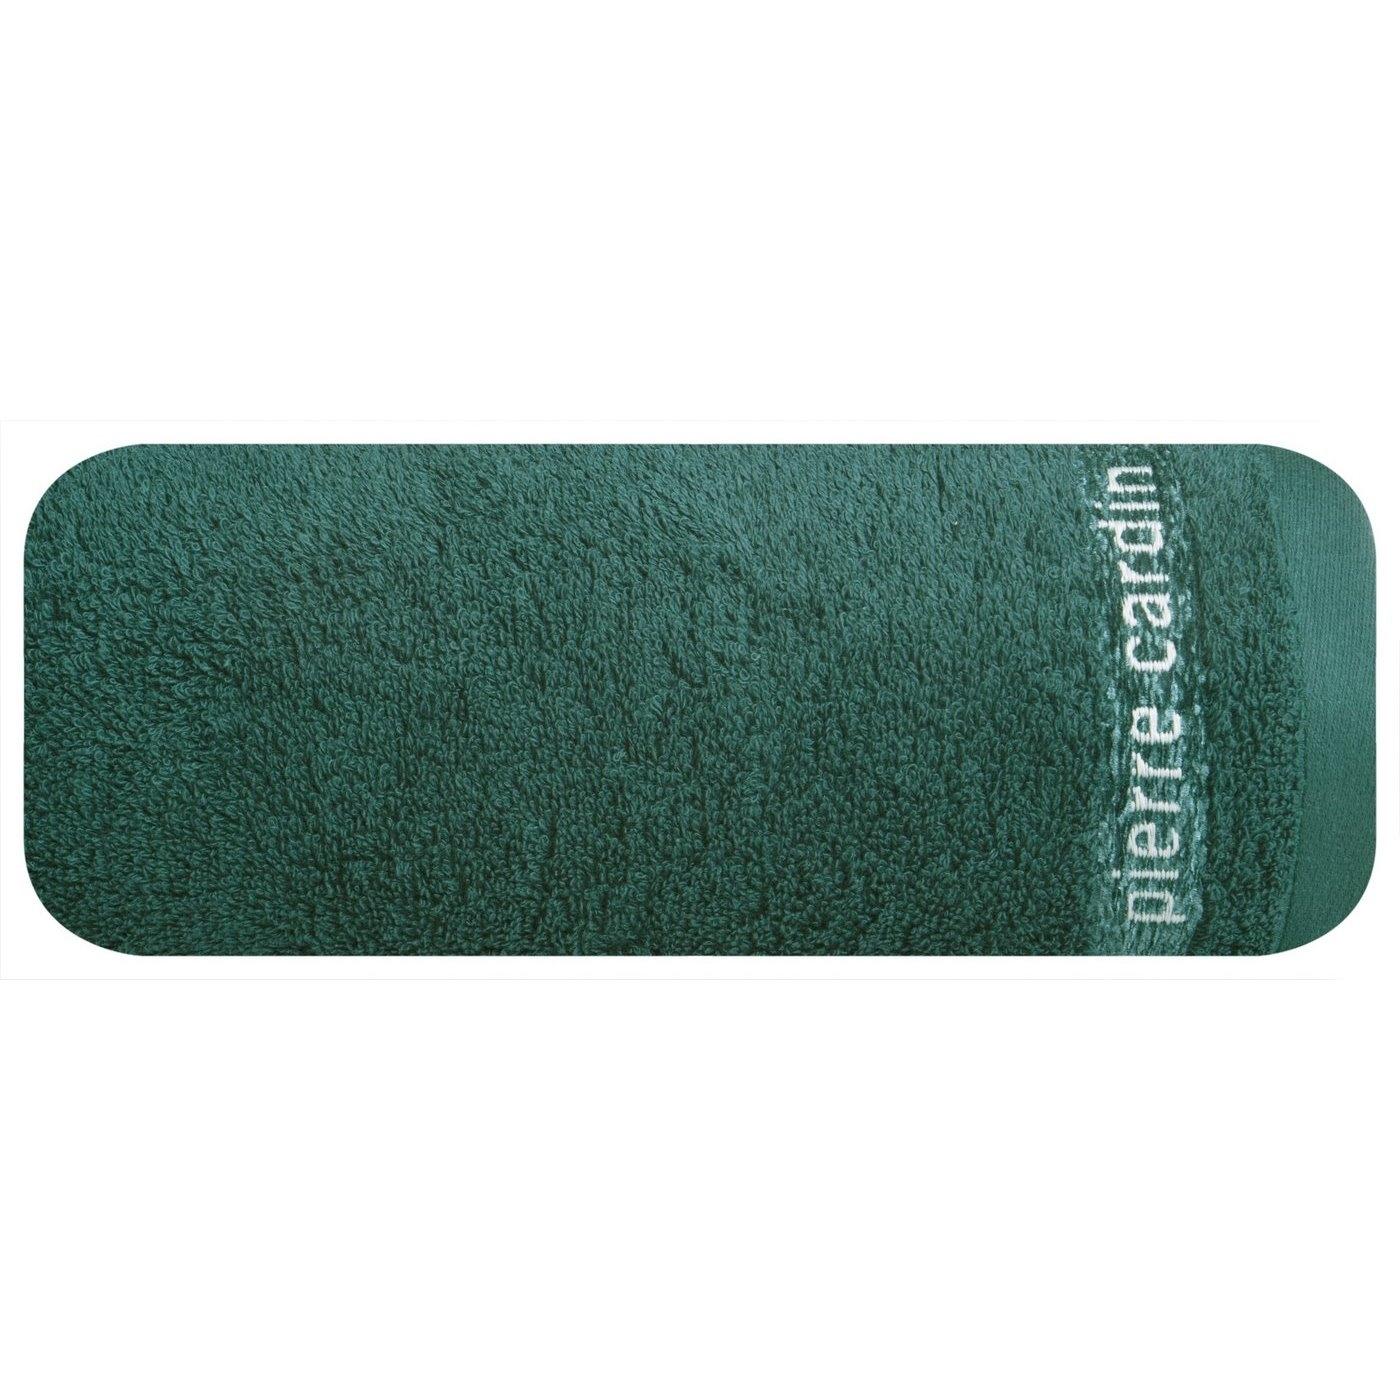 Prosop baie din bumbac Tom Pierre Cardin Verde inchis poza